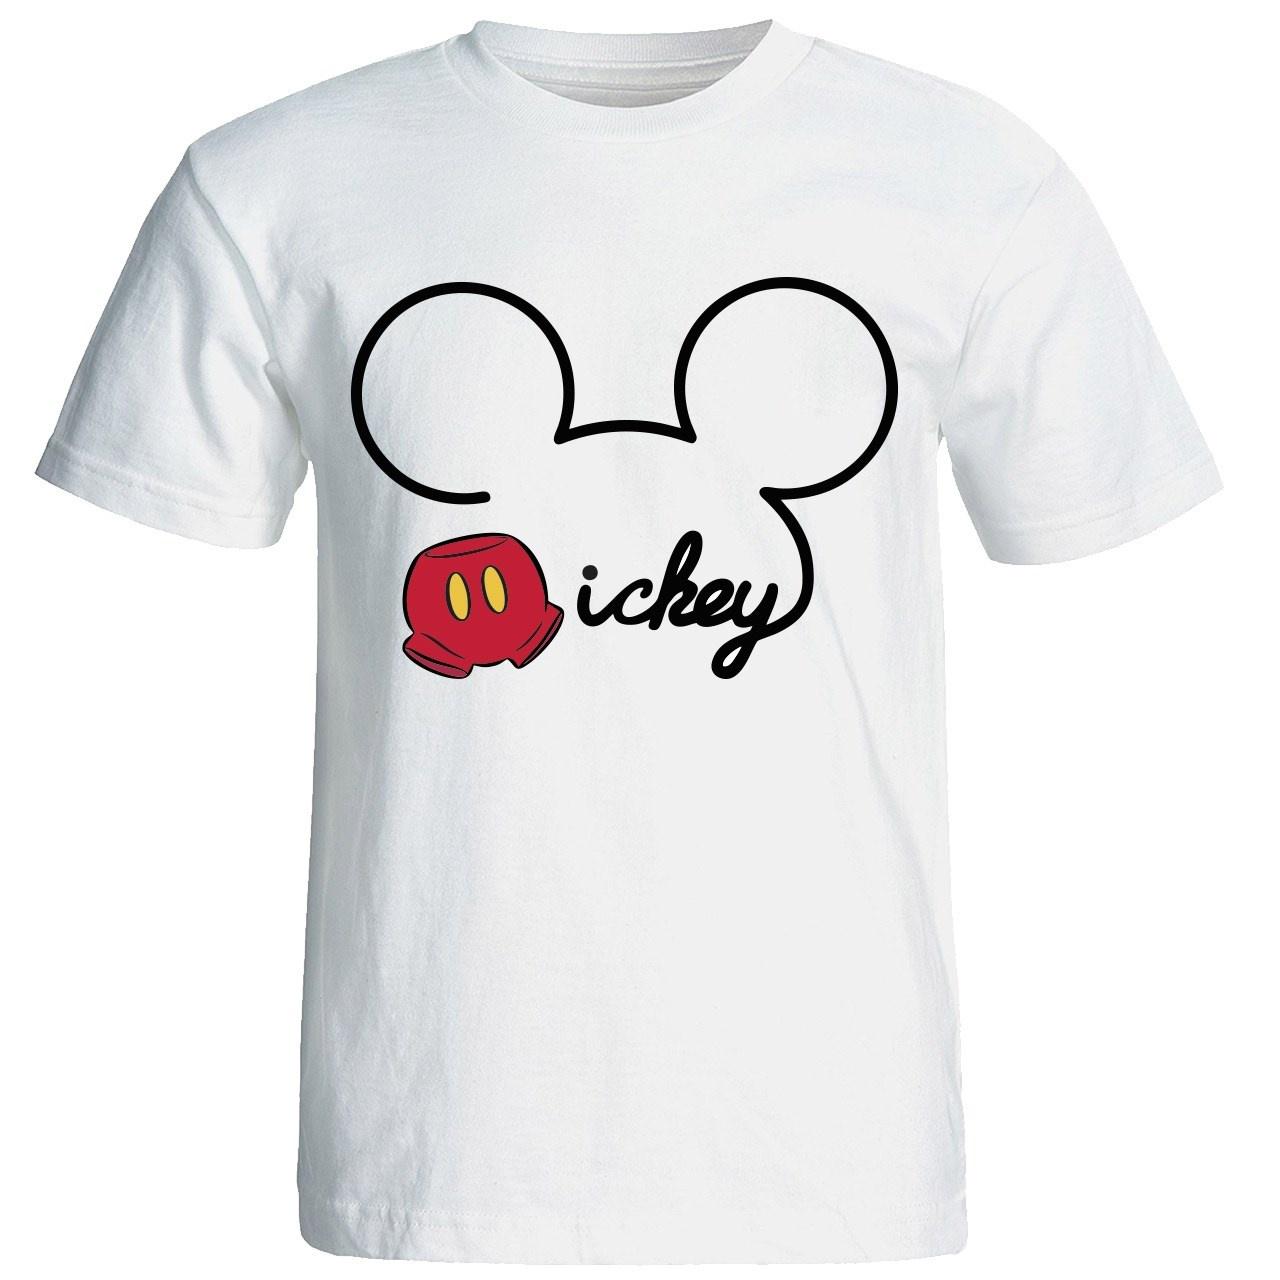 Photo of تی شرت آستین کوتاه مردانه شین دیزاین طرح میکی موس  کد 4491